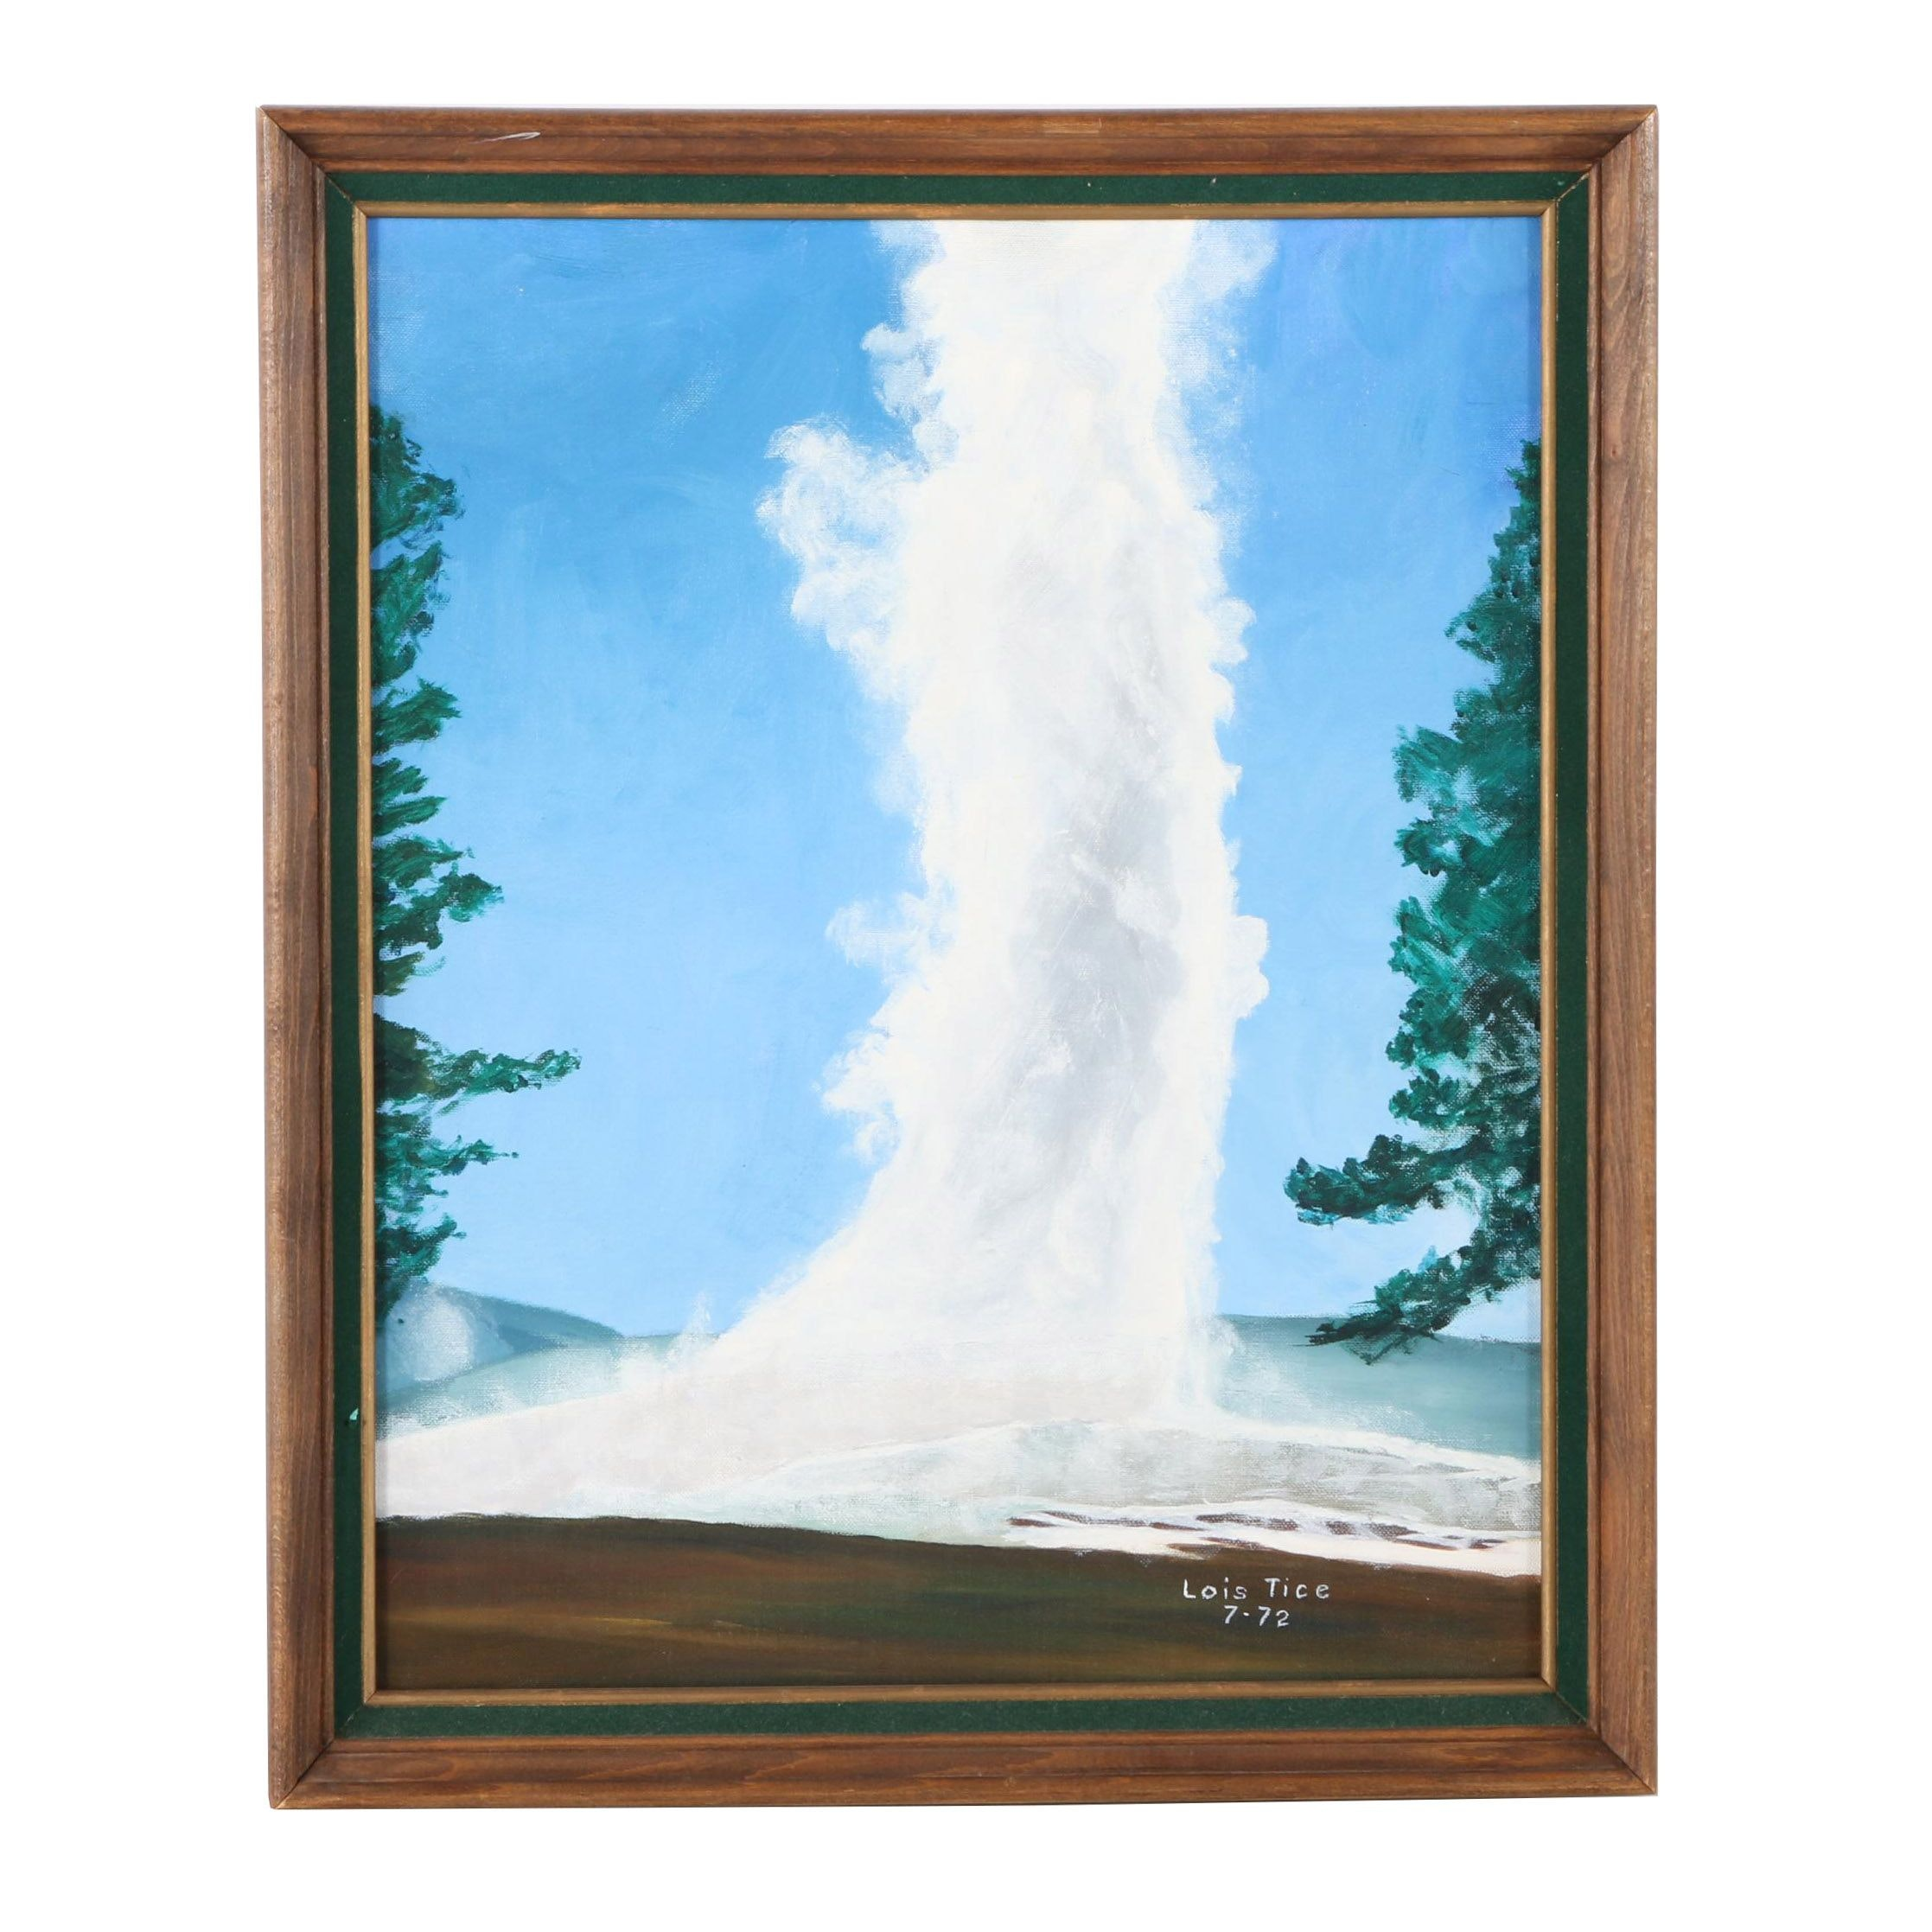 "Lois Tice Oil Painting on Canvas Board ""Old Faithful"""